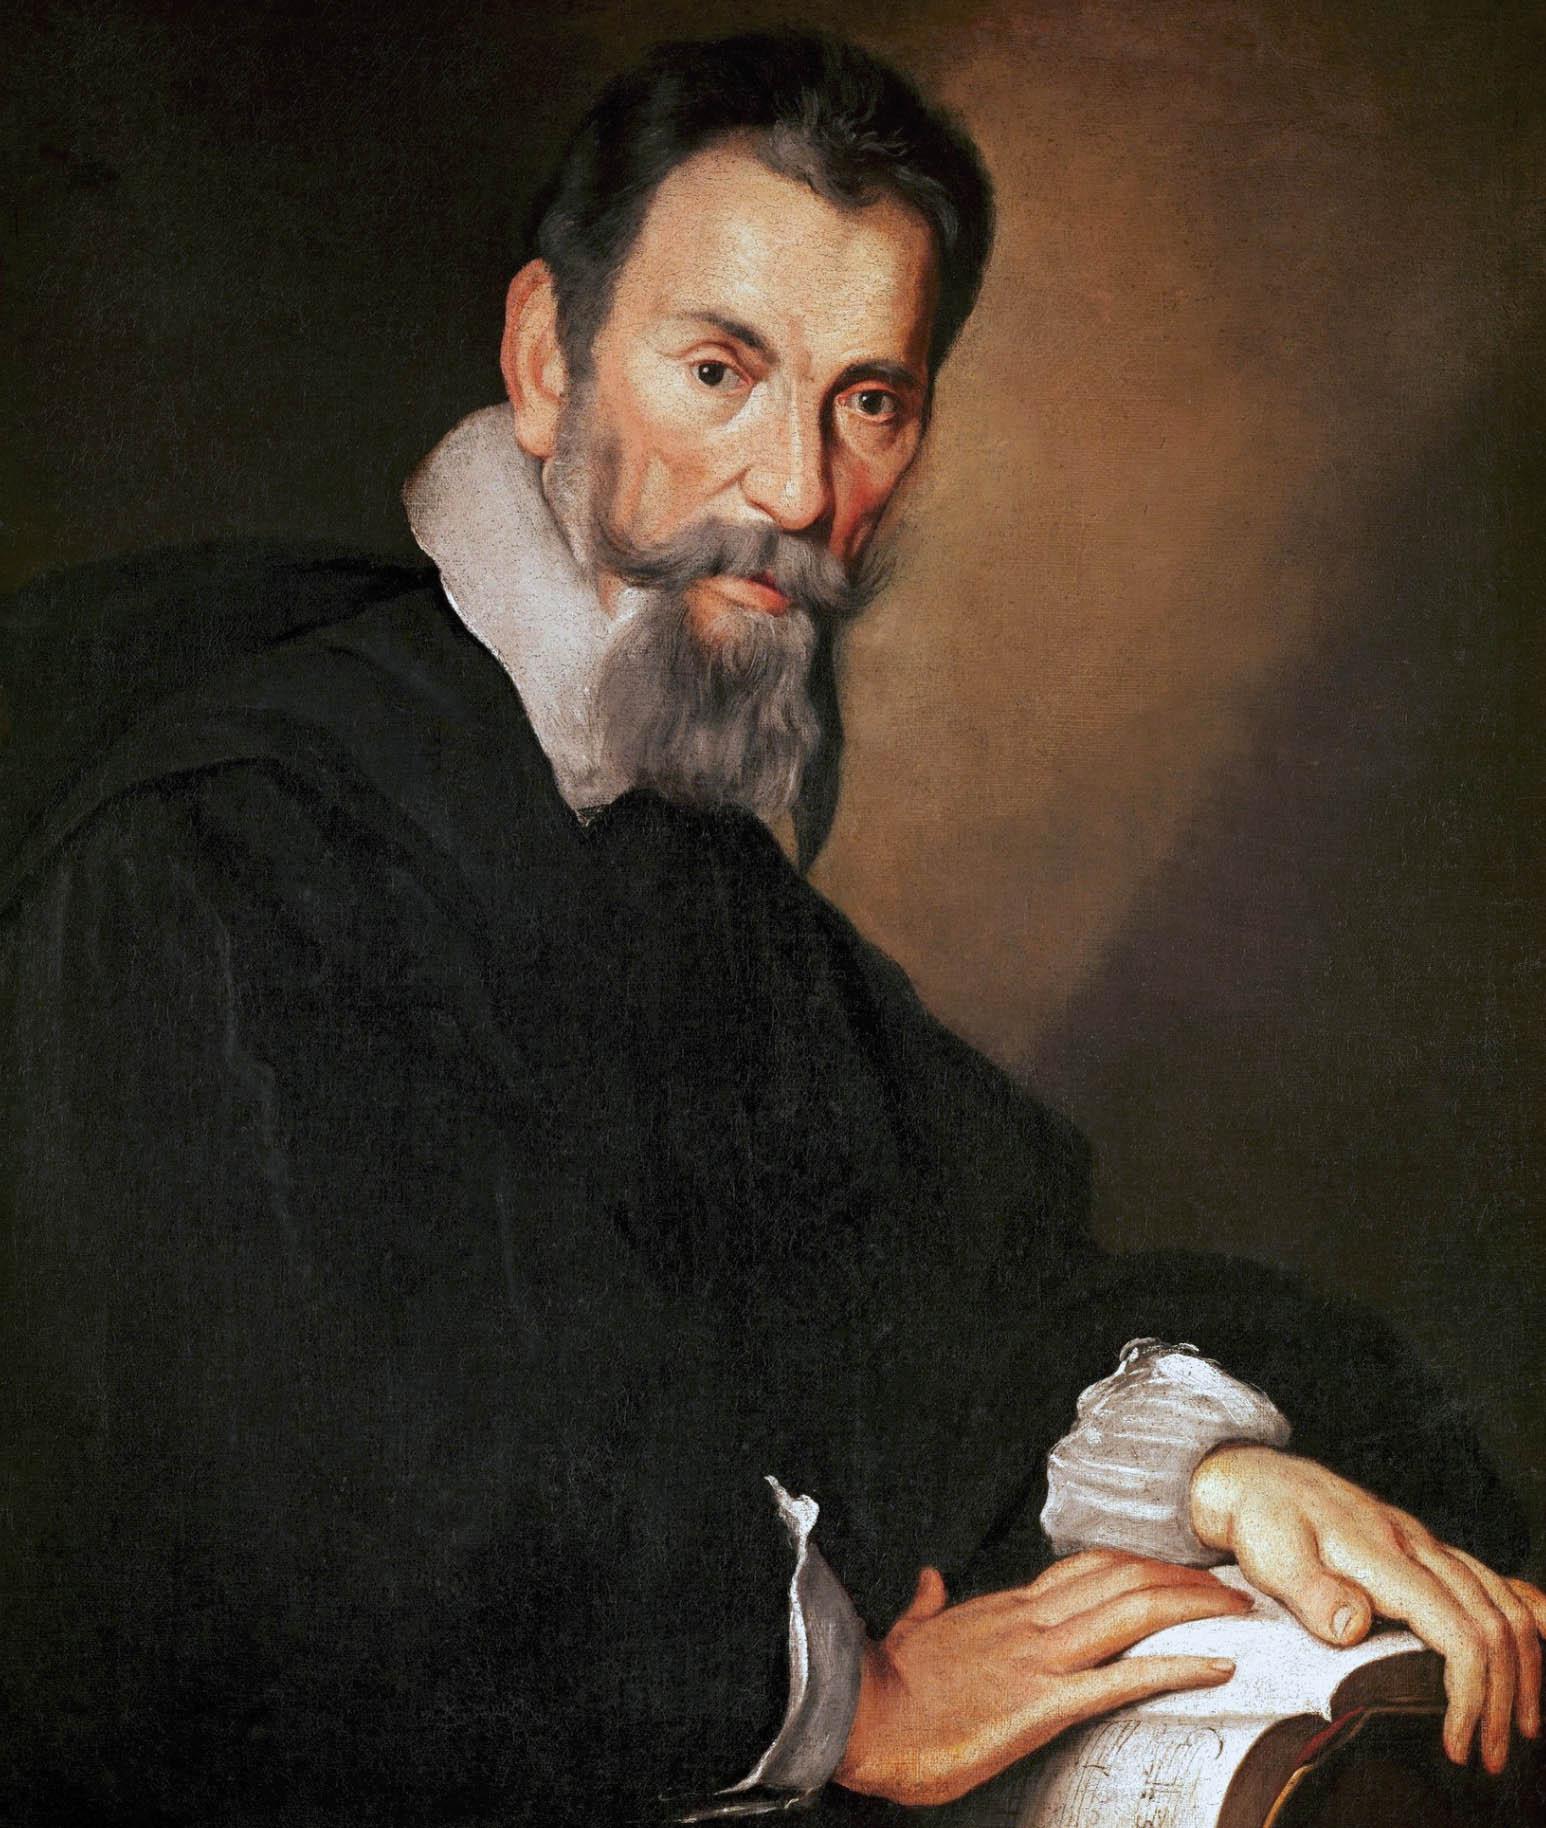 Claudio Monteverdi de Bernardo Strozzi -1640 - Ecole de musique vénitienne